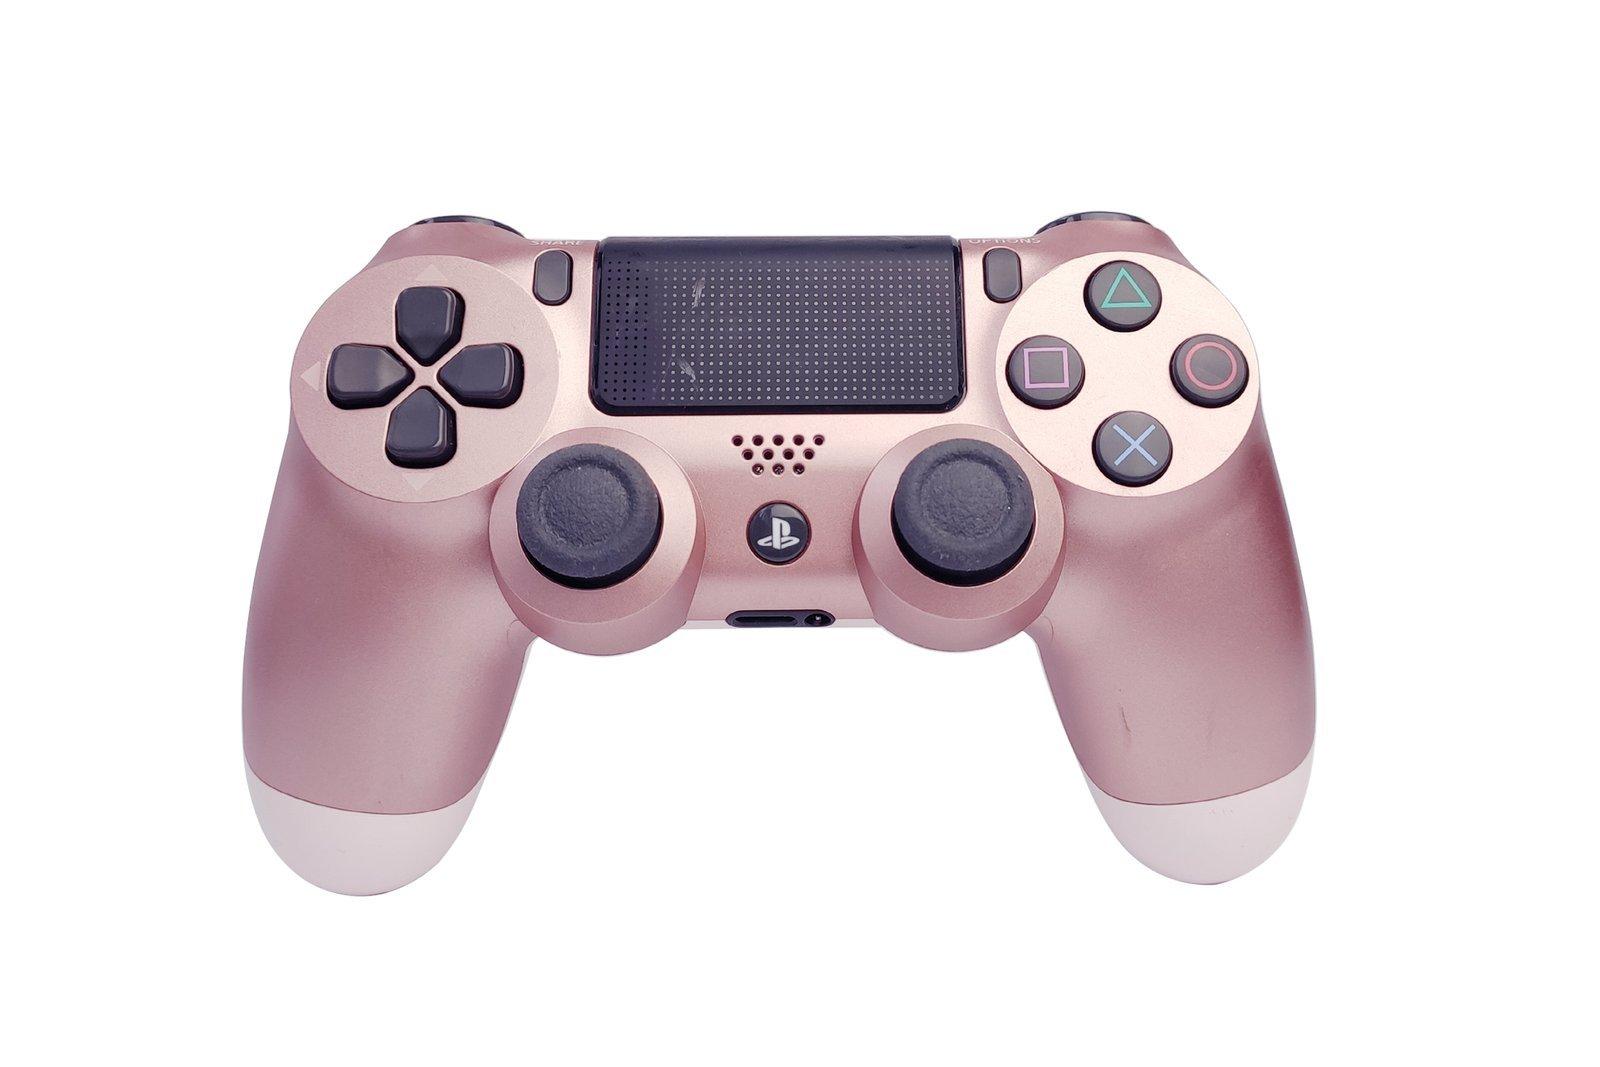 Controller Gamepad Playstation 4 PS4 v2 Rose Gold